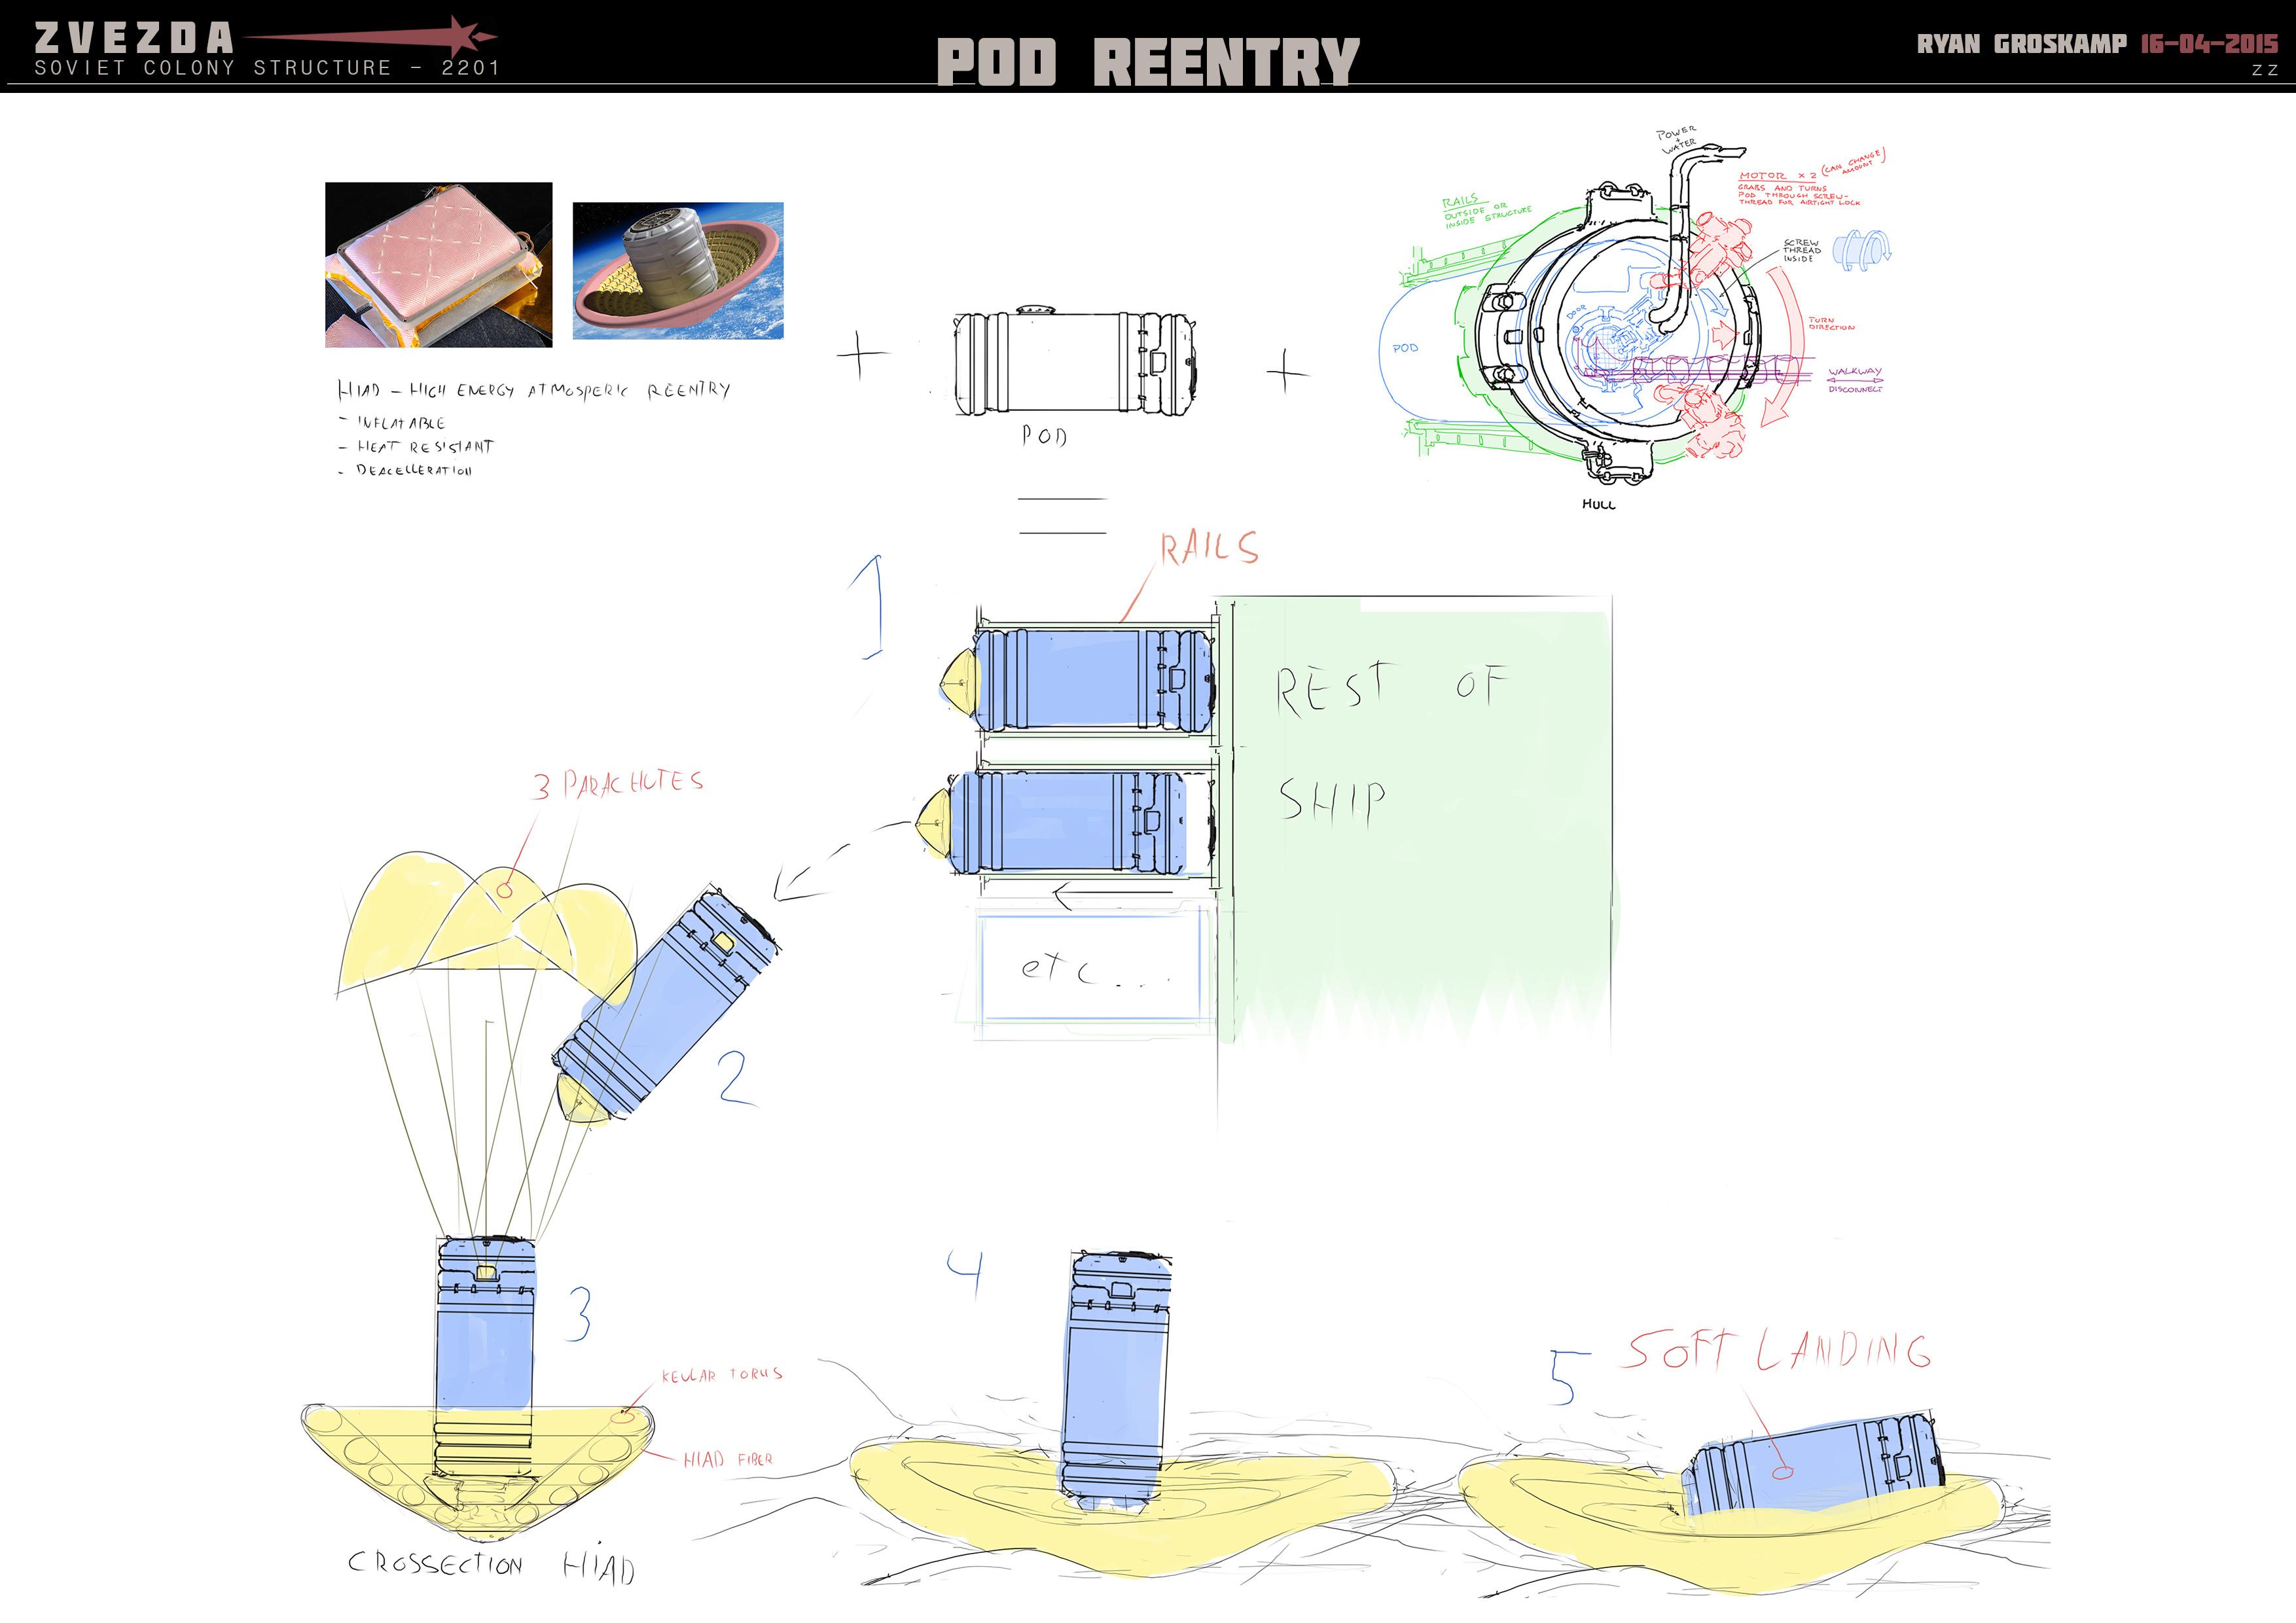 Pod Orbital reentry concept design